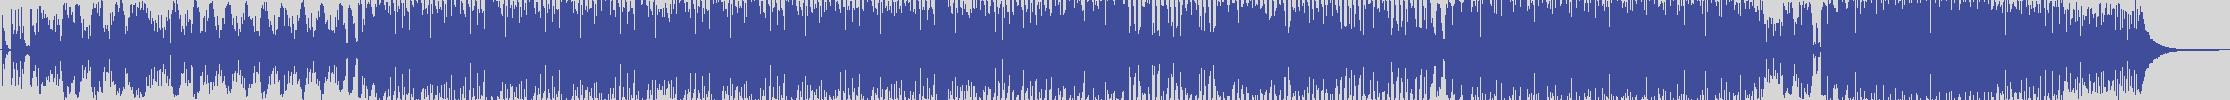 smilax_dig_records [Smilax_X448DIG] Mangu - Il Gioco Dell'estate [Original Mix] audio wave form